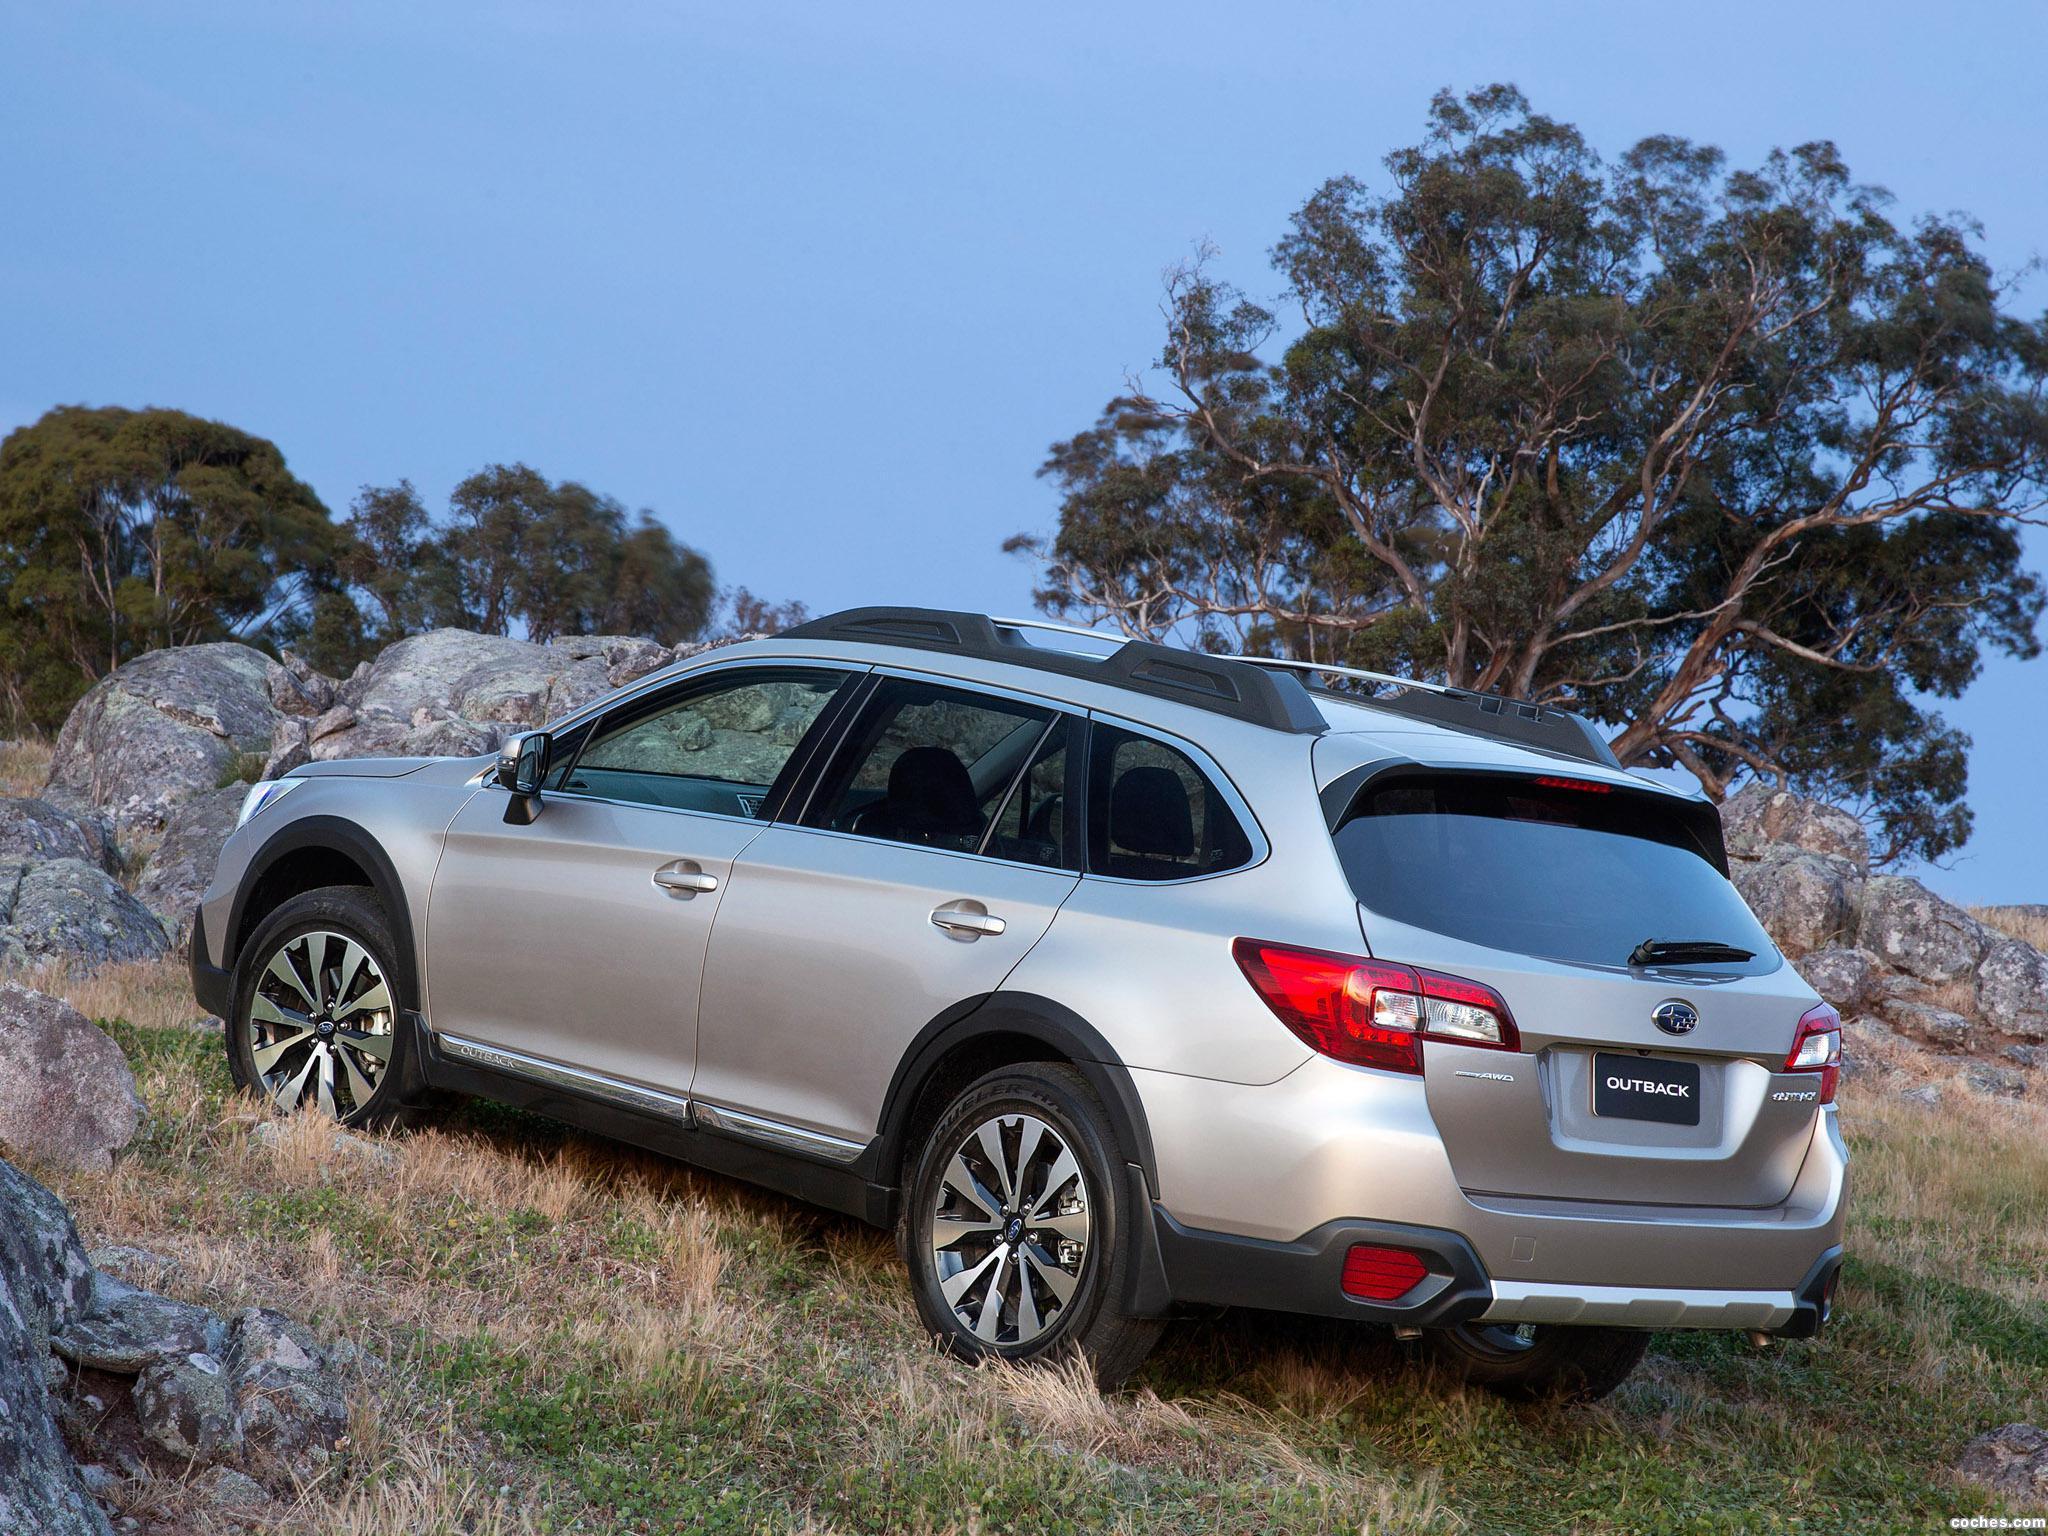 Foto 3 de Subaru Outback 3.6R Australia 2014